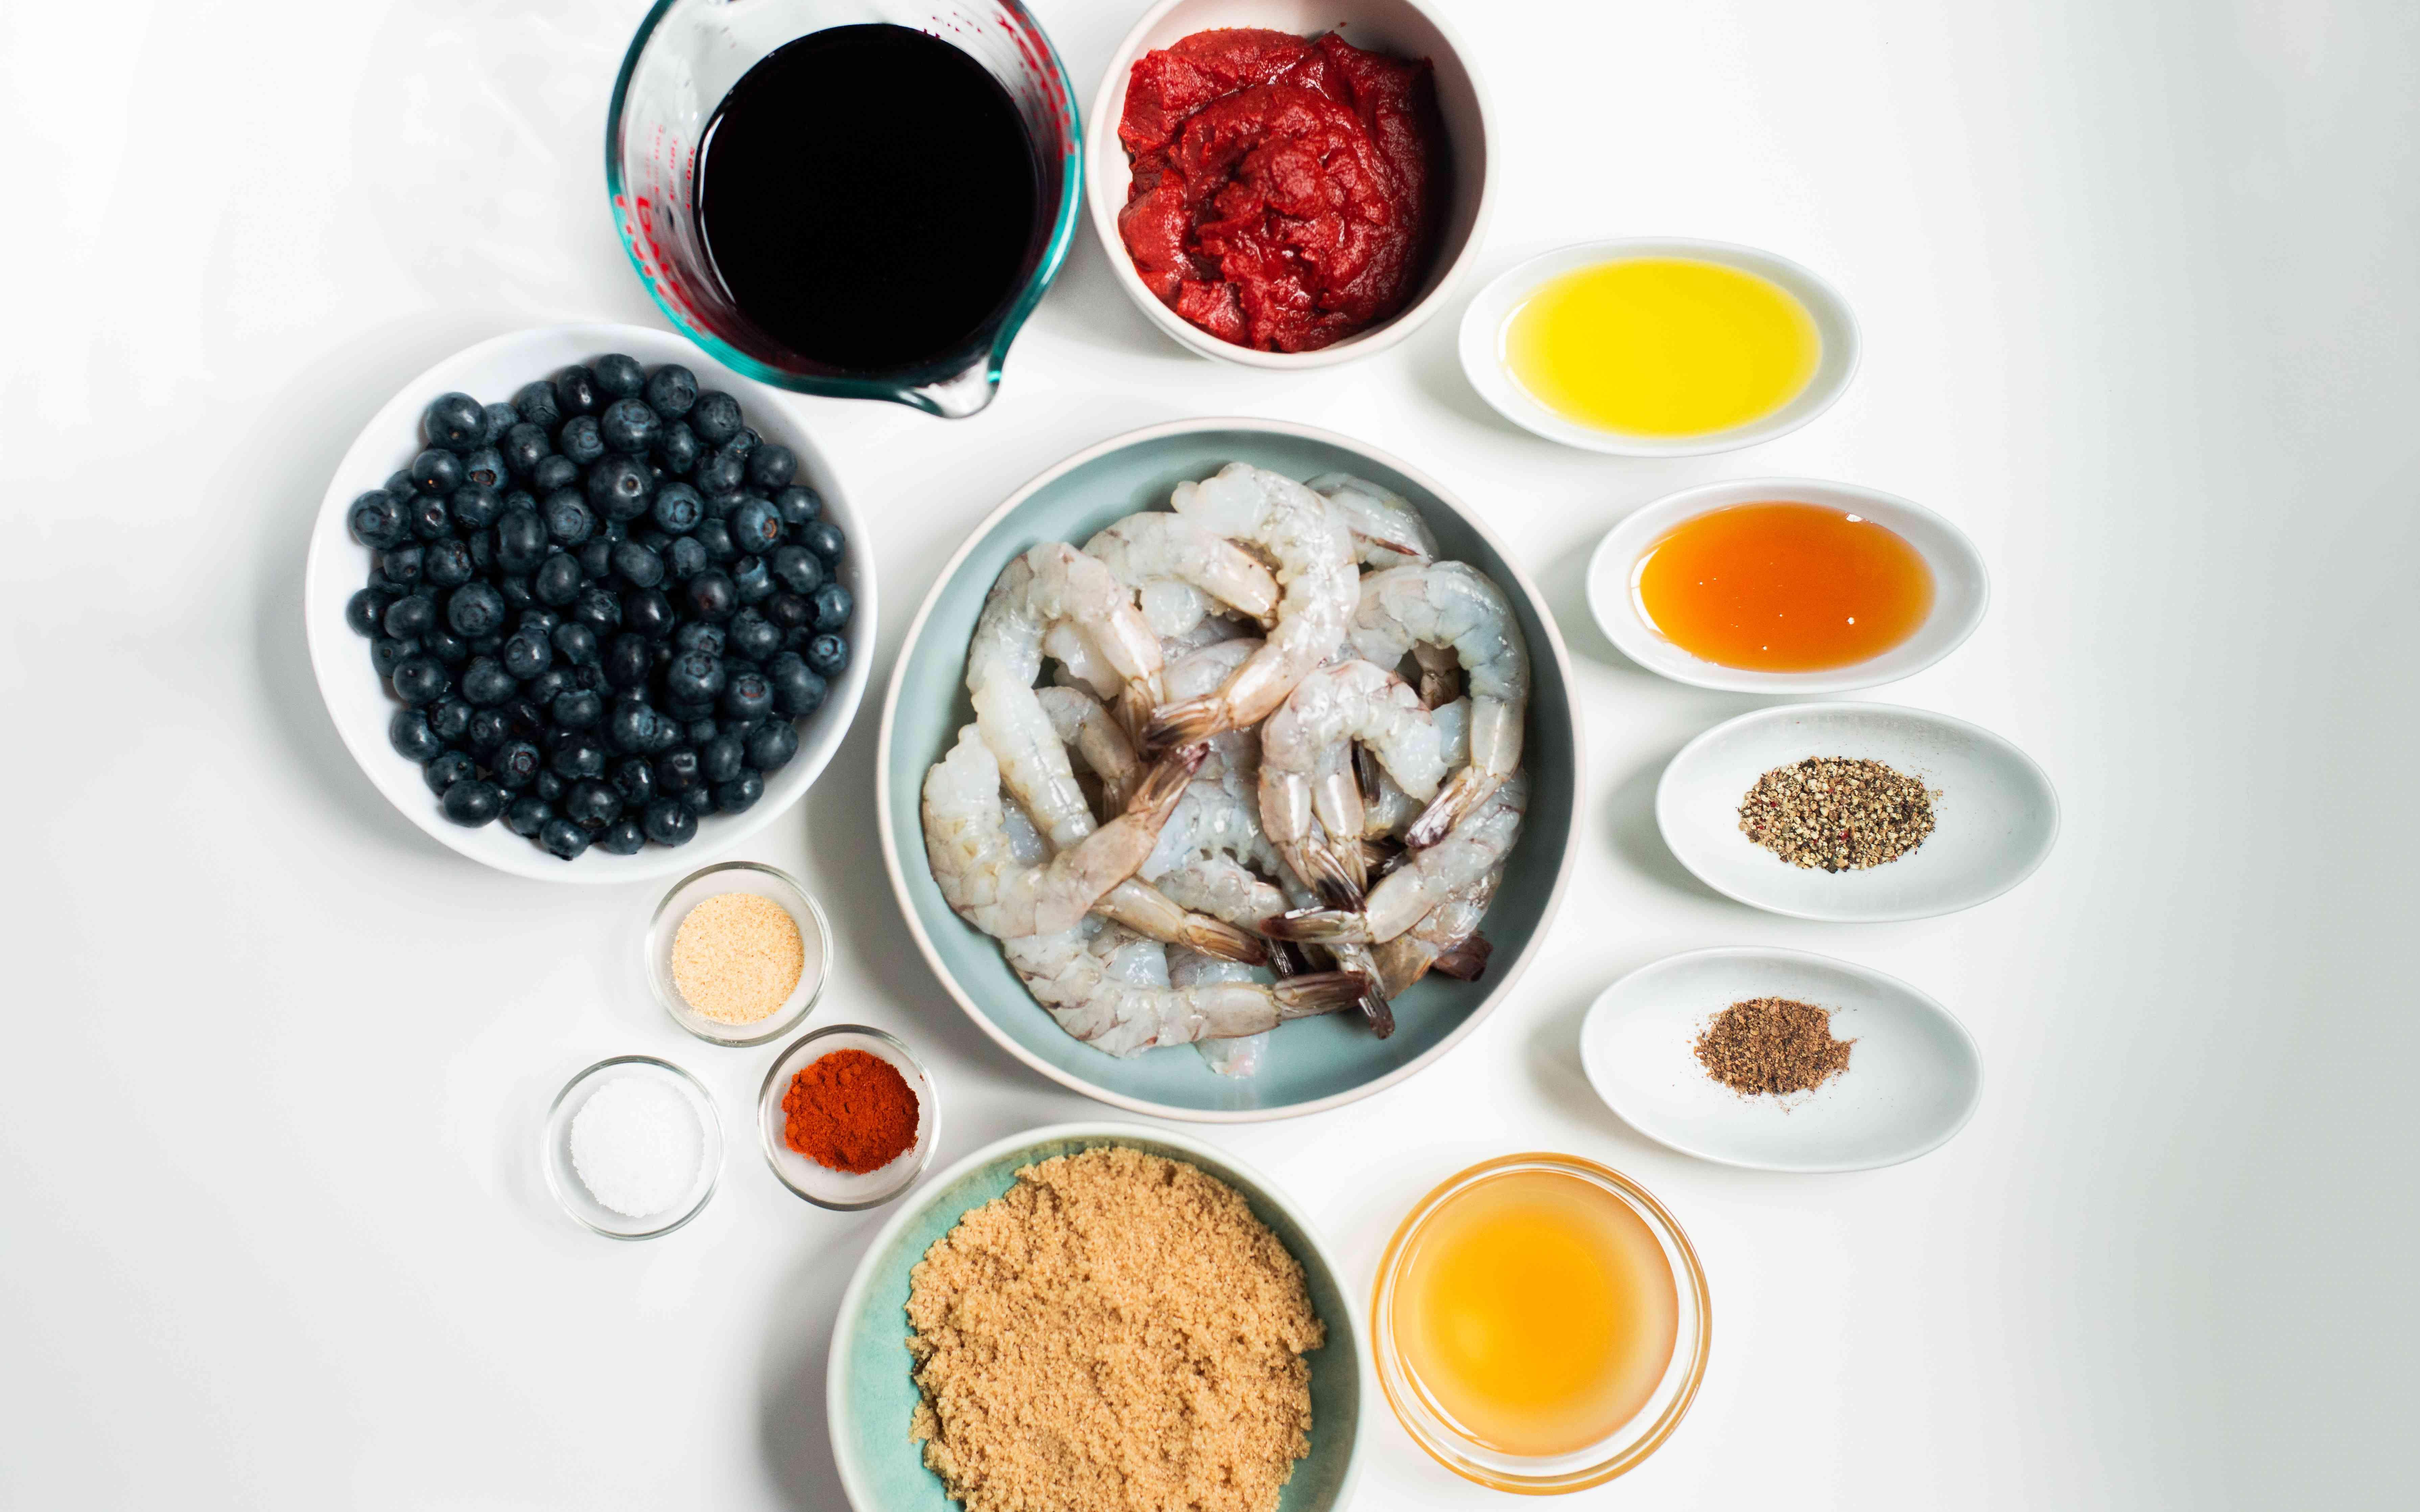 Blueberry BBQ shrimp skewers recipe